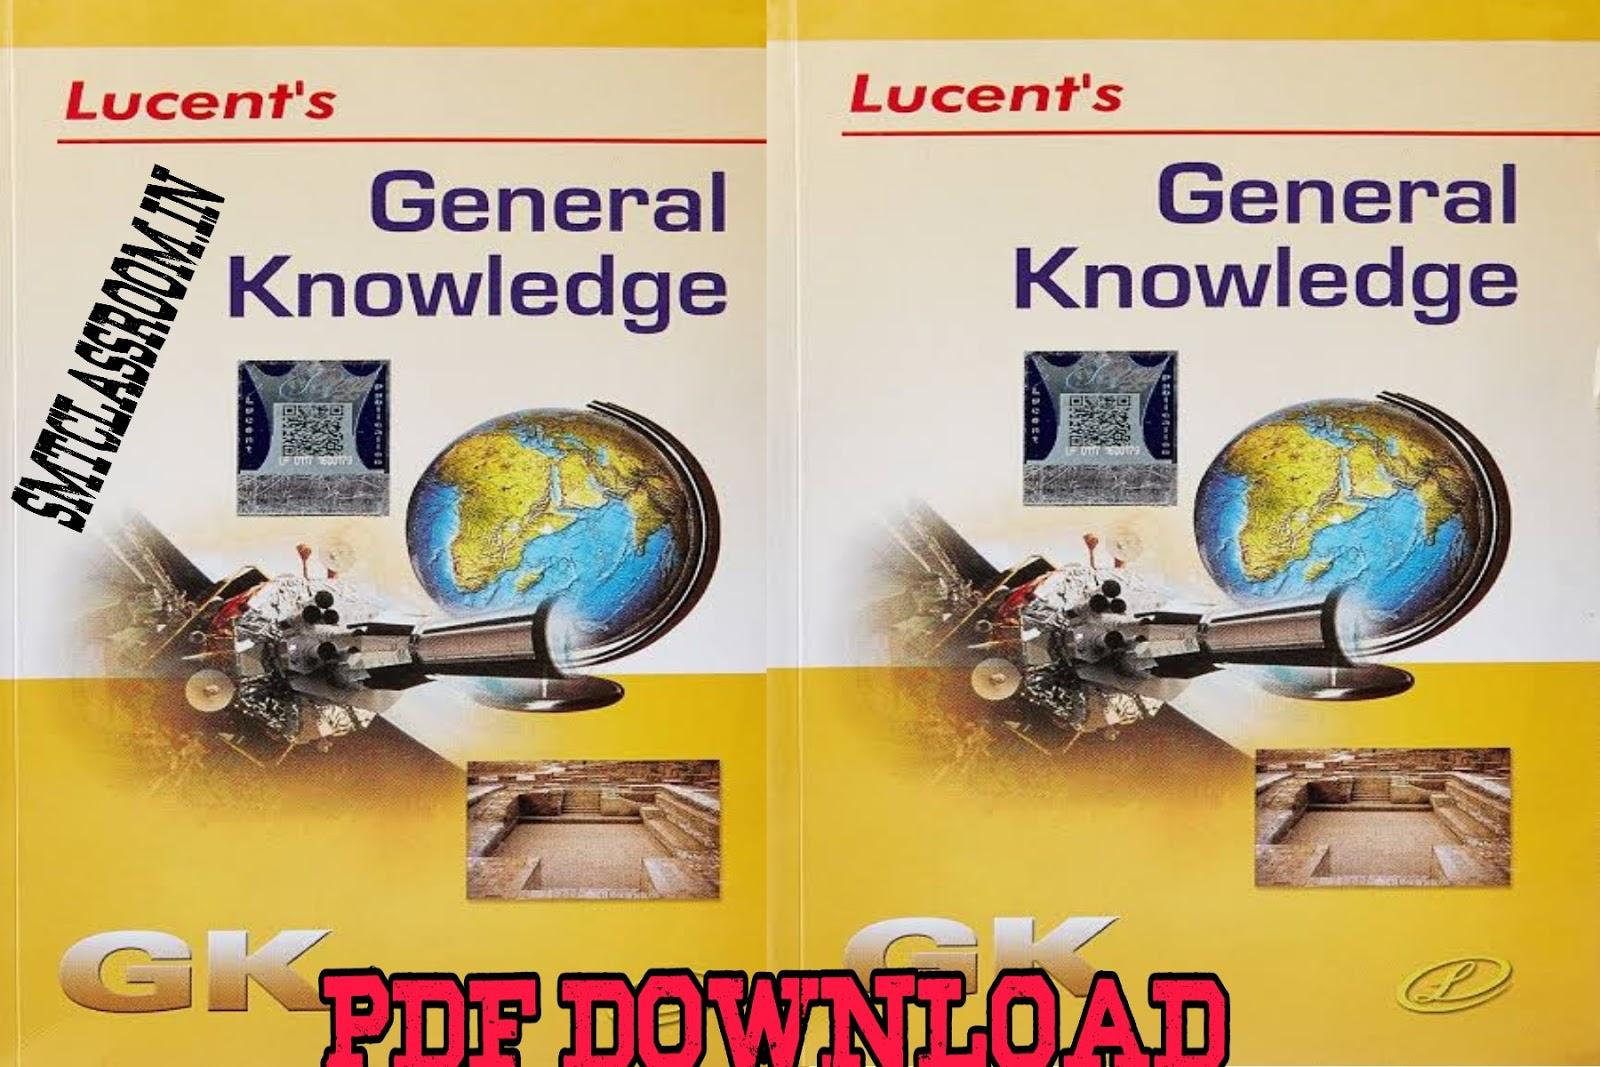 lucent gk,lucent gk book,lucent gk pdf,lucent gk audio,lucent gk book pdf,lucent,lucent gk pdf book download,lucent gk geography,lucent gk history,latest lucent gk book pdf download,latest lucent gk book pdf download in hindi,second edition lucent gk book pdf download,lucent audio,lucent gk 2019 hindi pdf download,lucent gk book in pdf,lucent gk in hindi, lucent gk book 2020 pdf